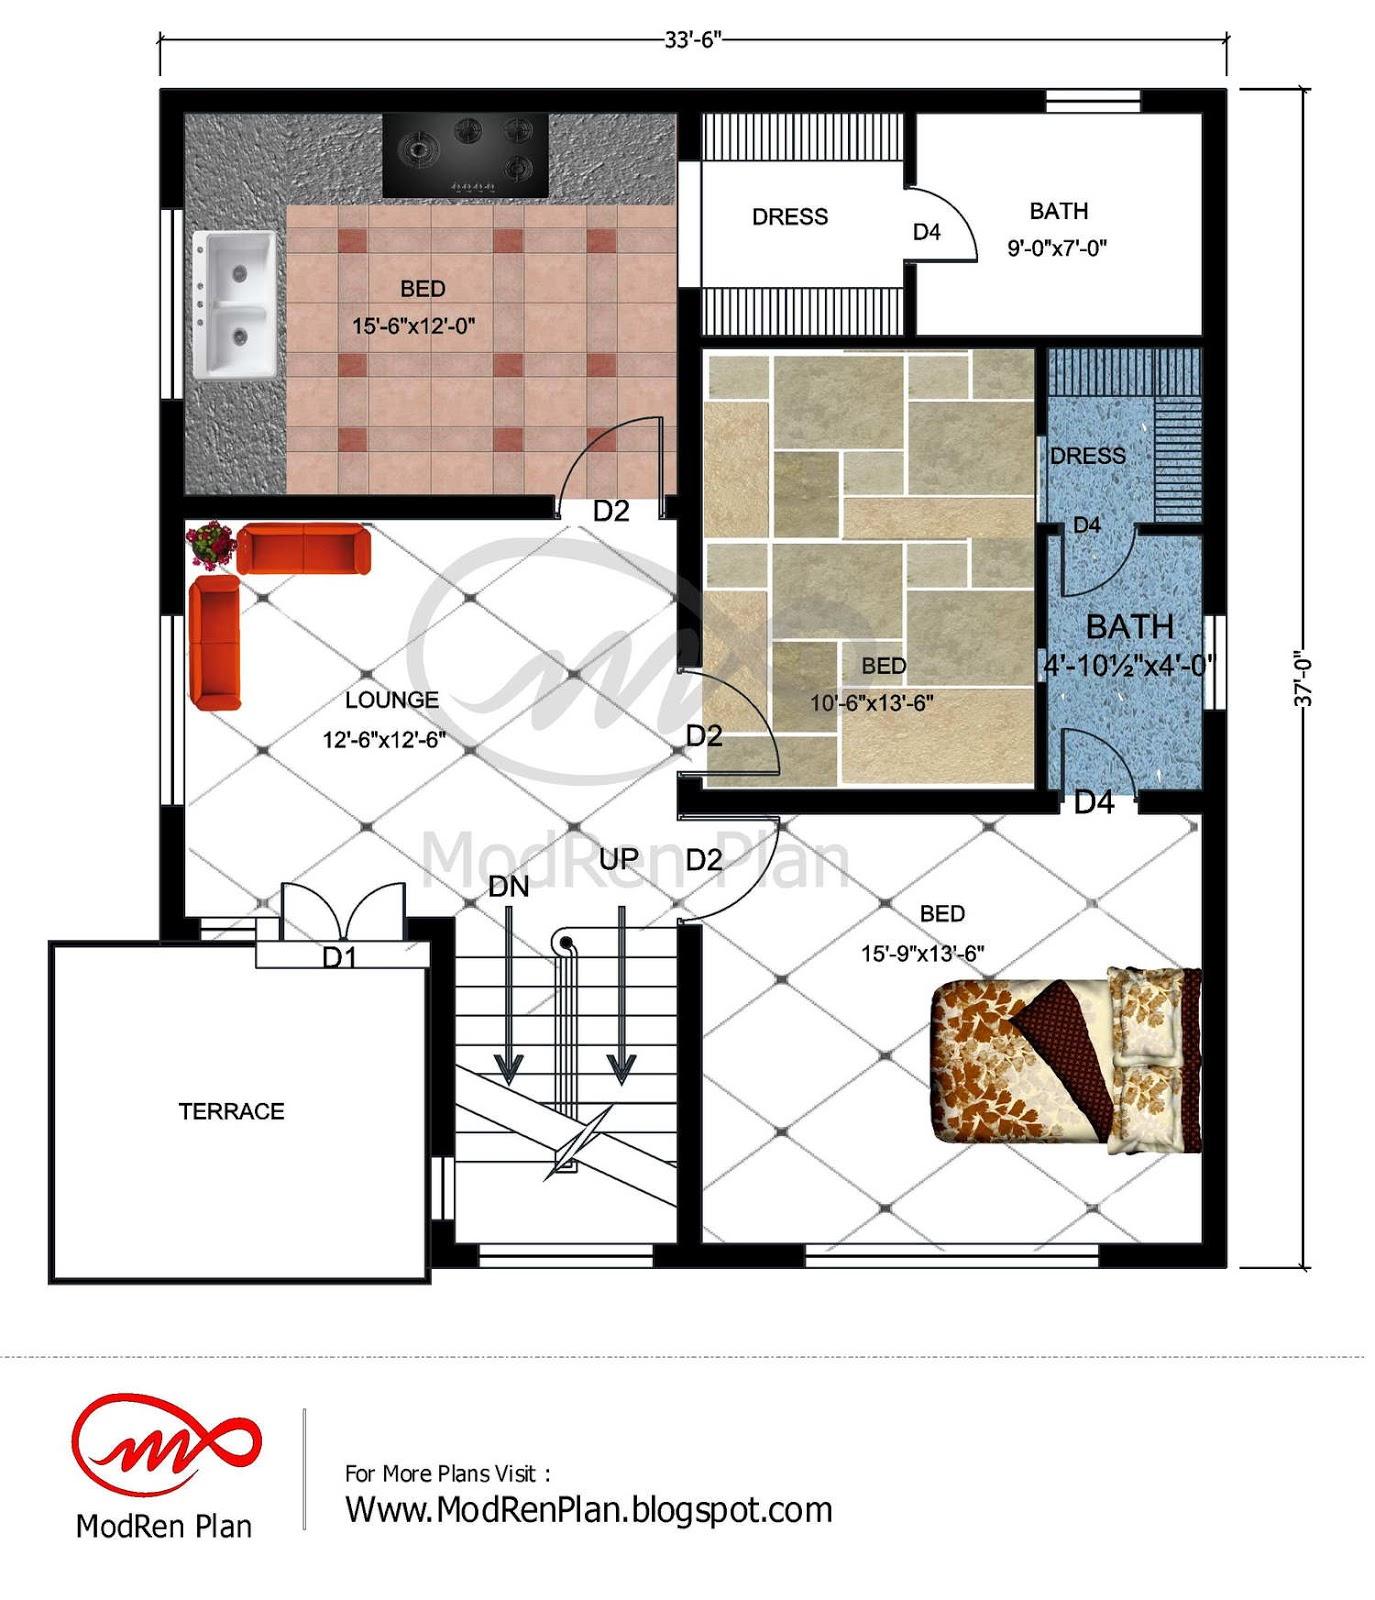 7 marla house plan  1800 sq ft  46x41 feet www.modrenplan ...